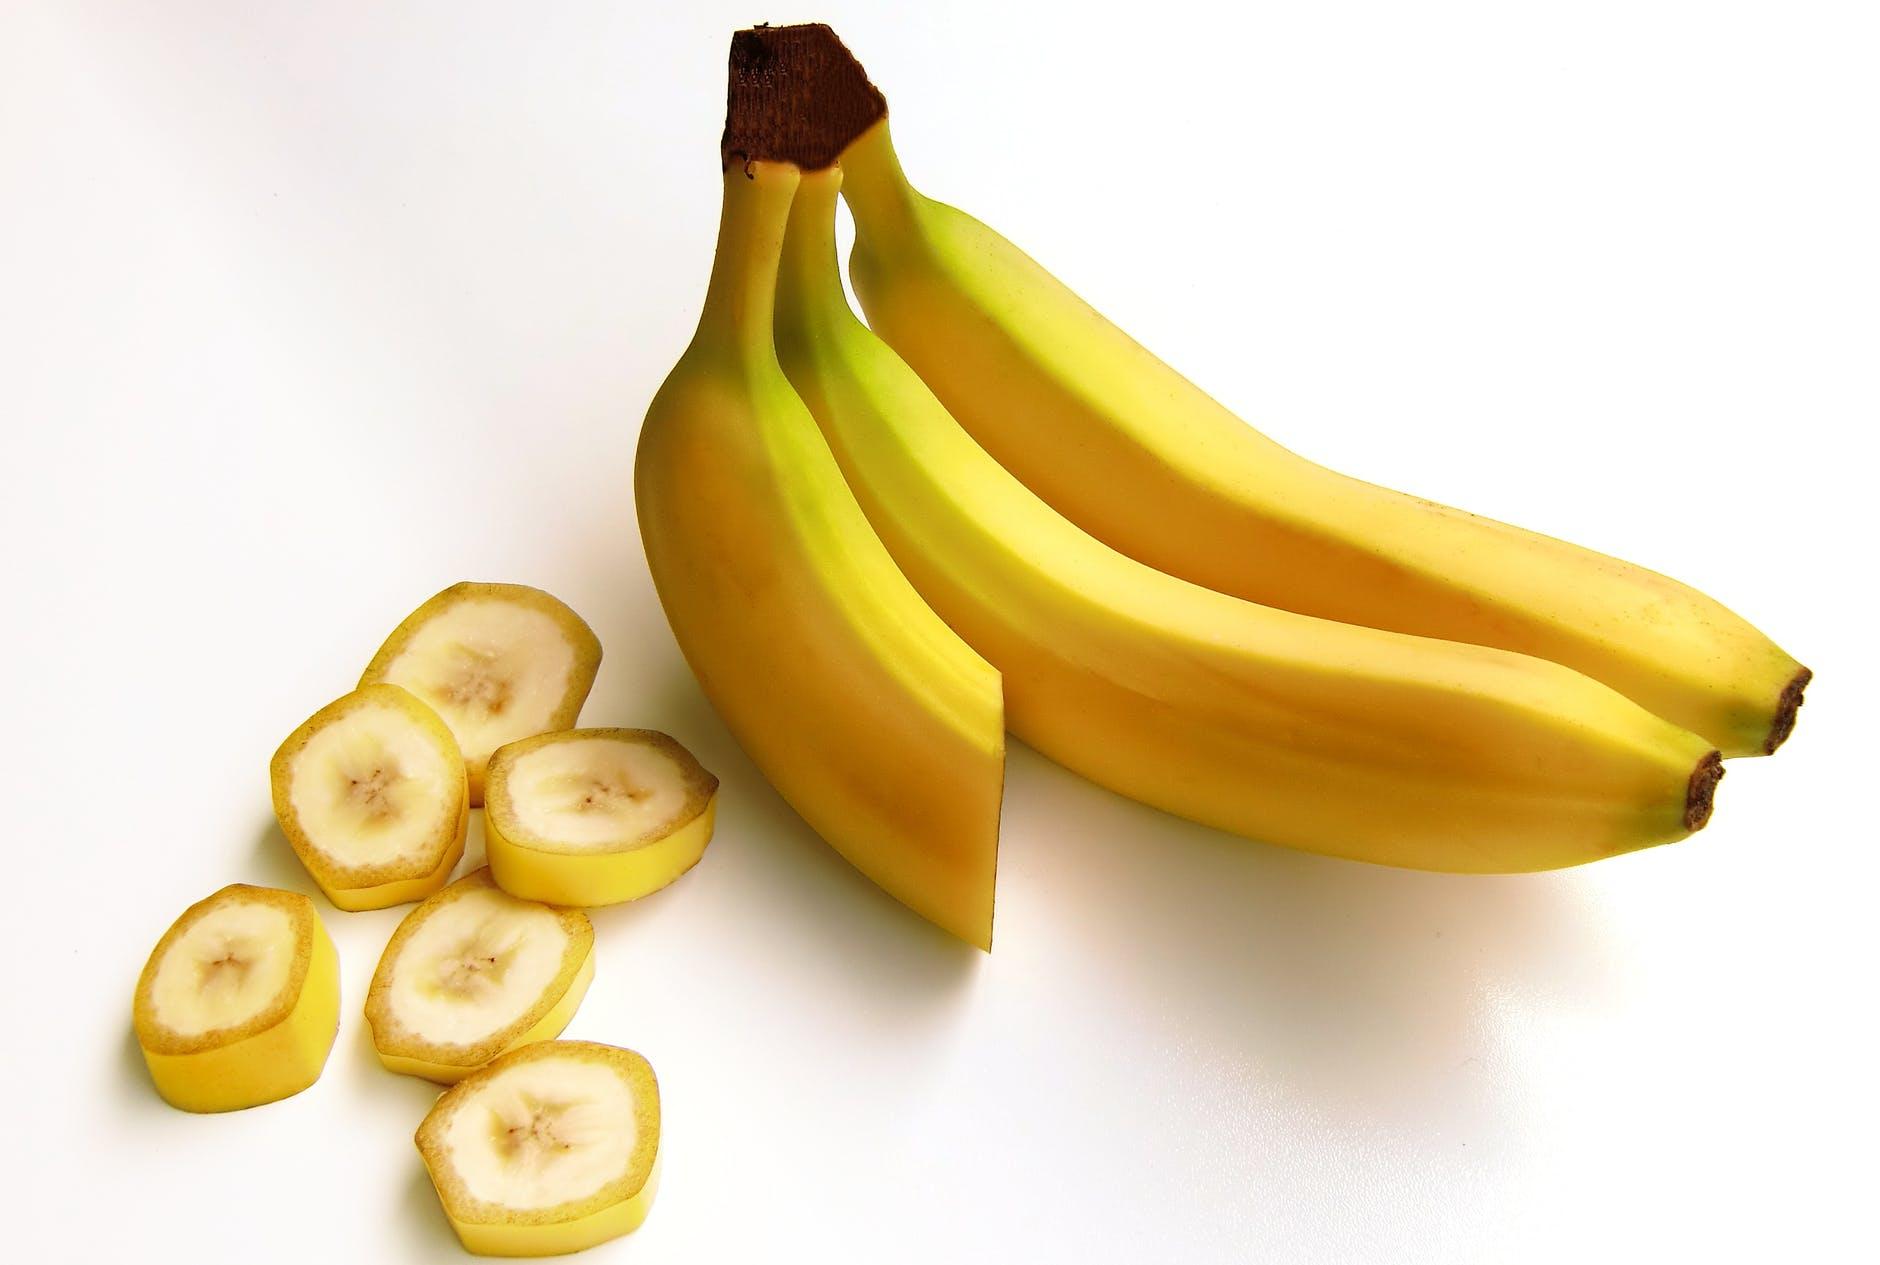 Reeta mit Banane abzunehmen